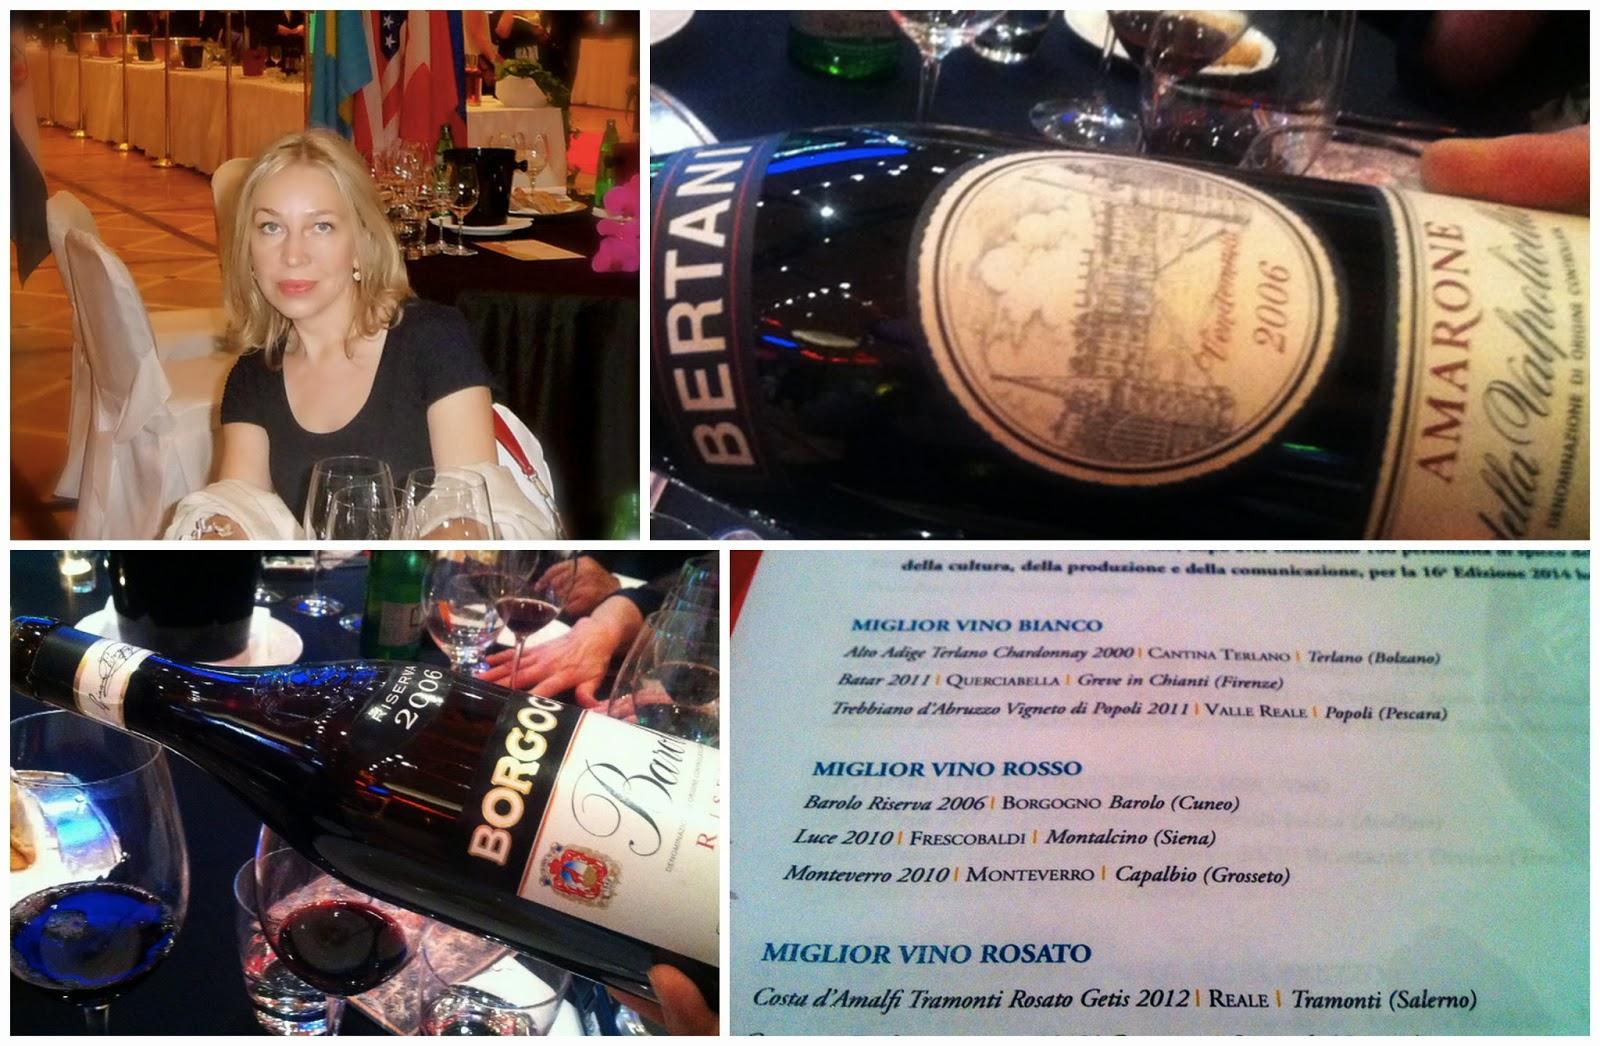 Oscar del Vino 2014 Лучшее красное вино Бароло Боргоньо Ризерва Barolo Borgogno Riserva 2006